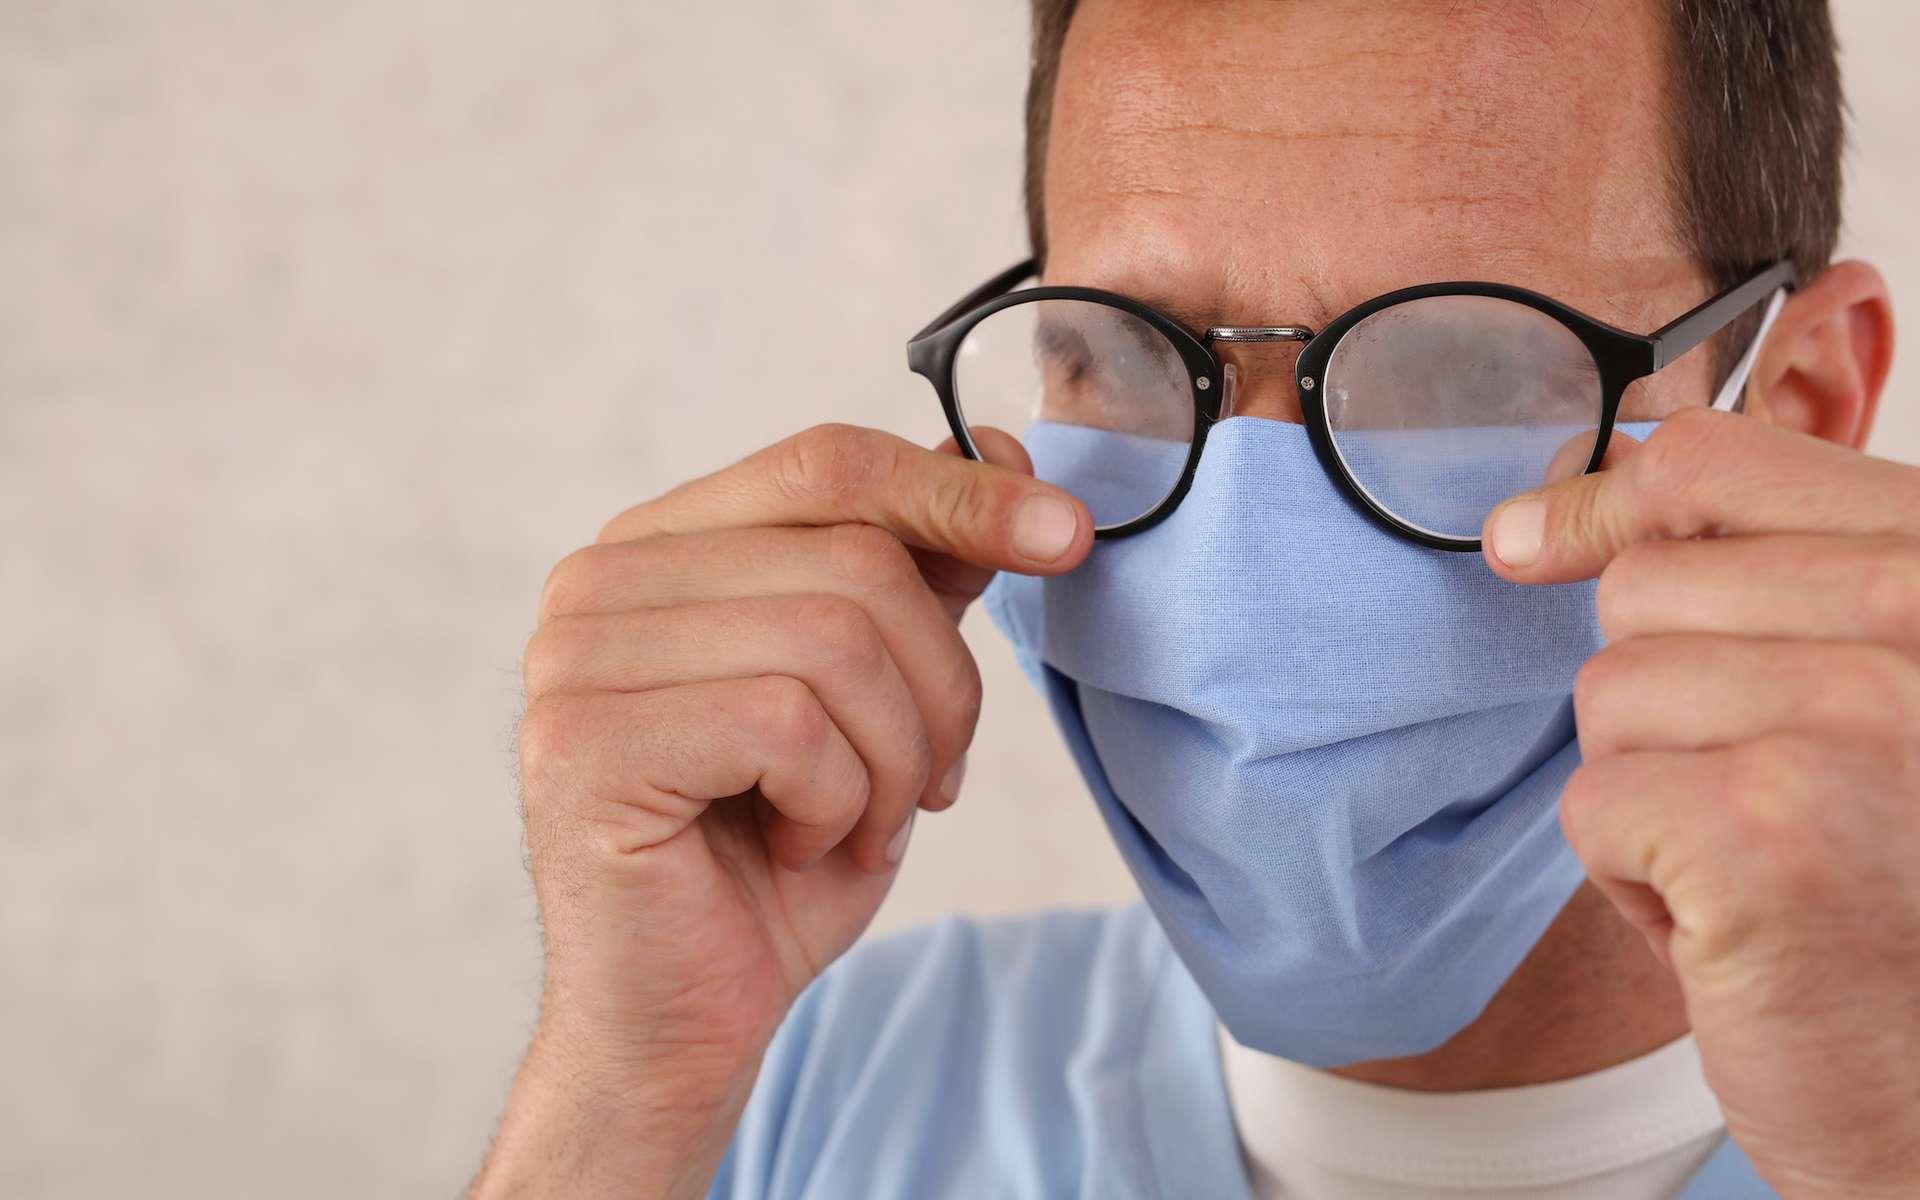 La condensation sur les lunettes gêne fortement la vision. © glisic_albina, Adobe Stock